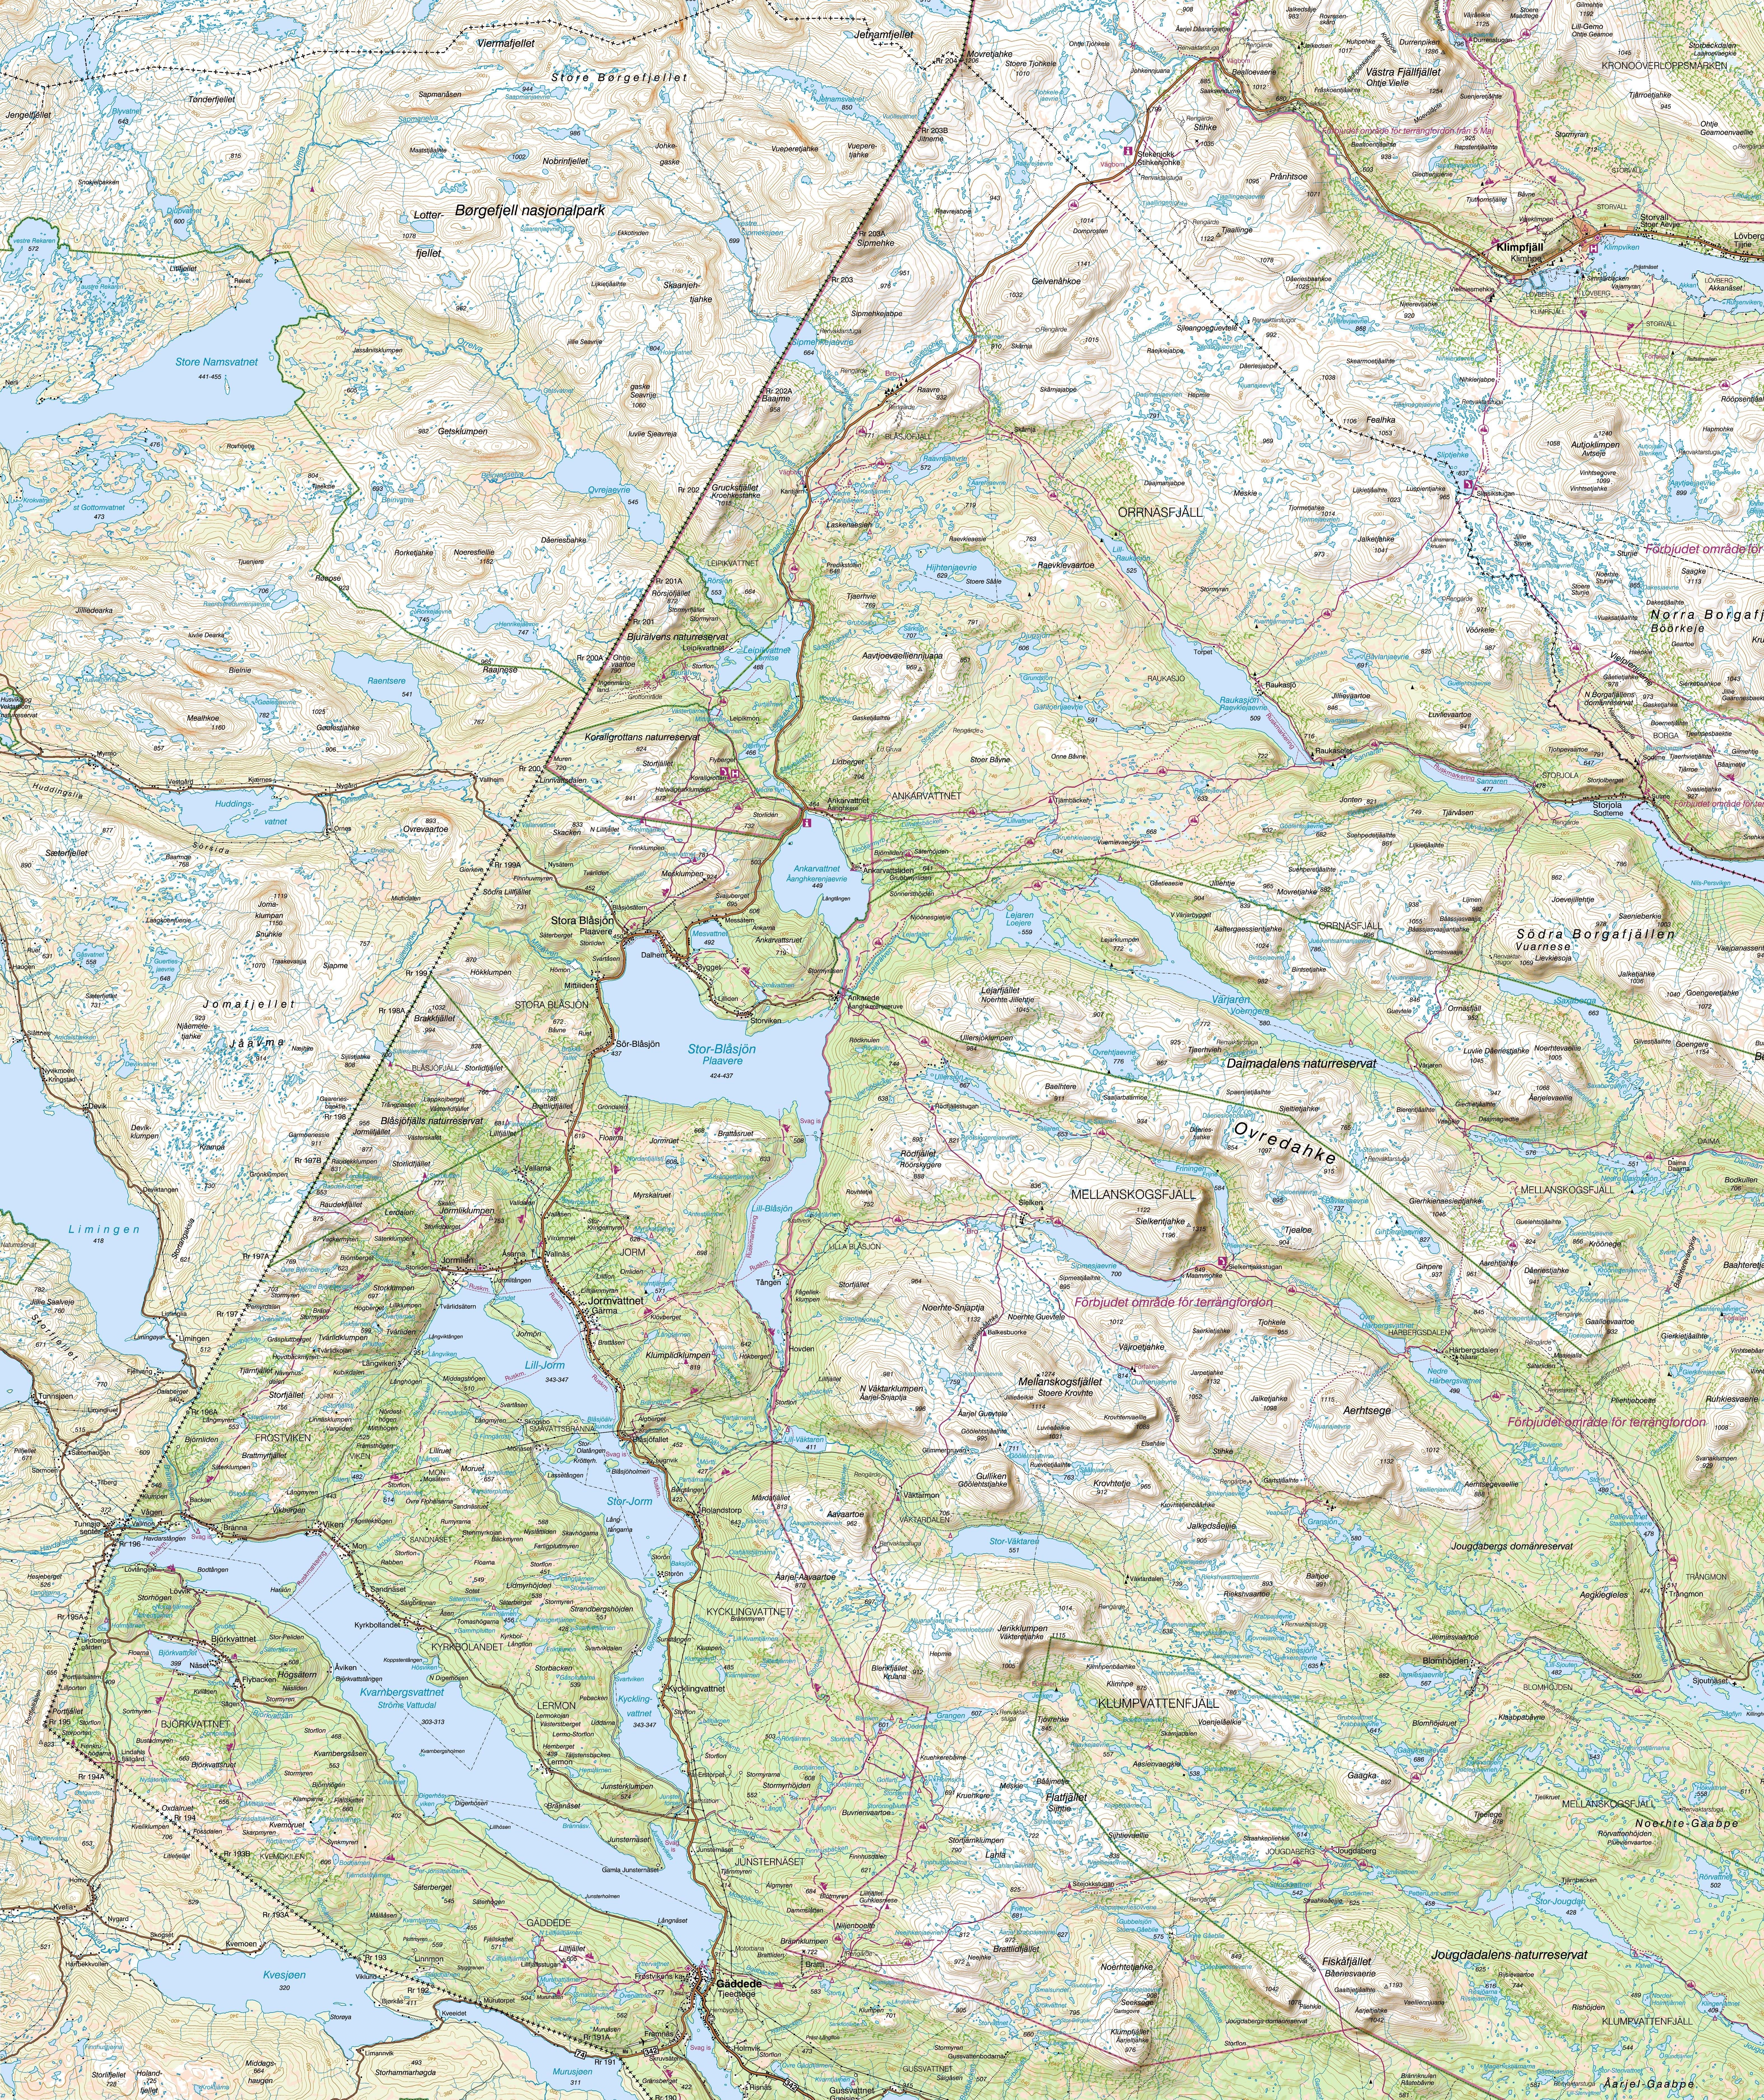 stekenjokk karta Fjällkartan stekenjokk karta